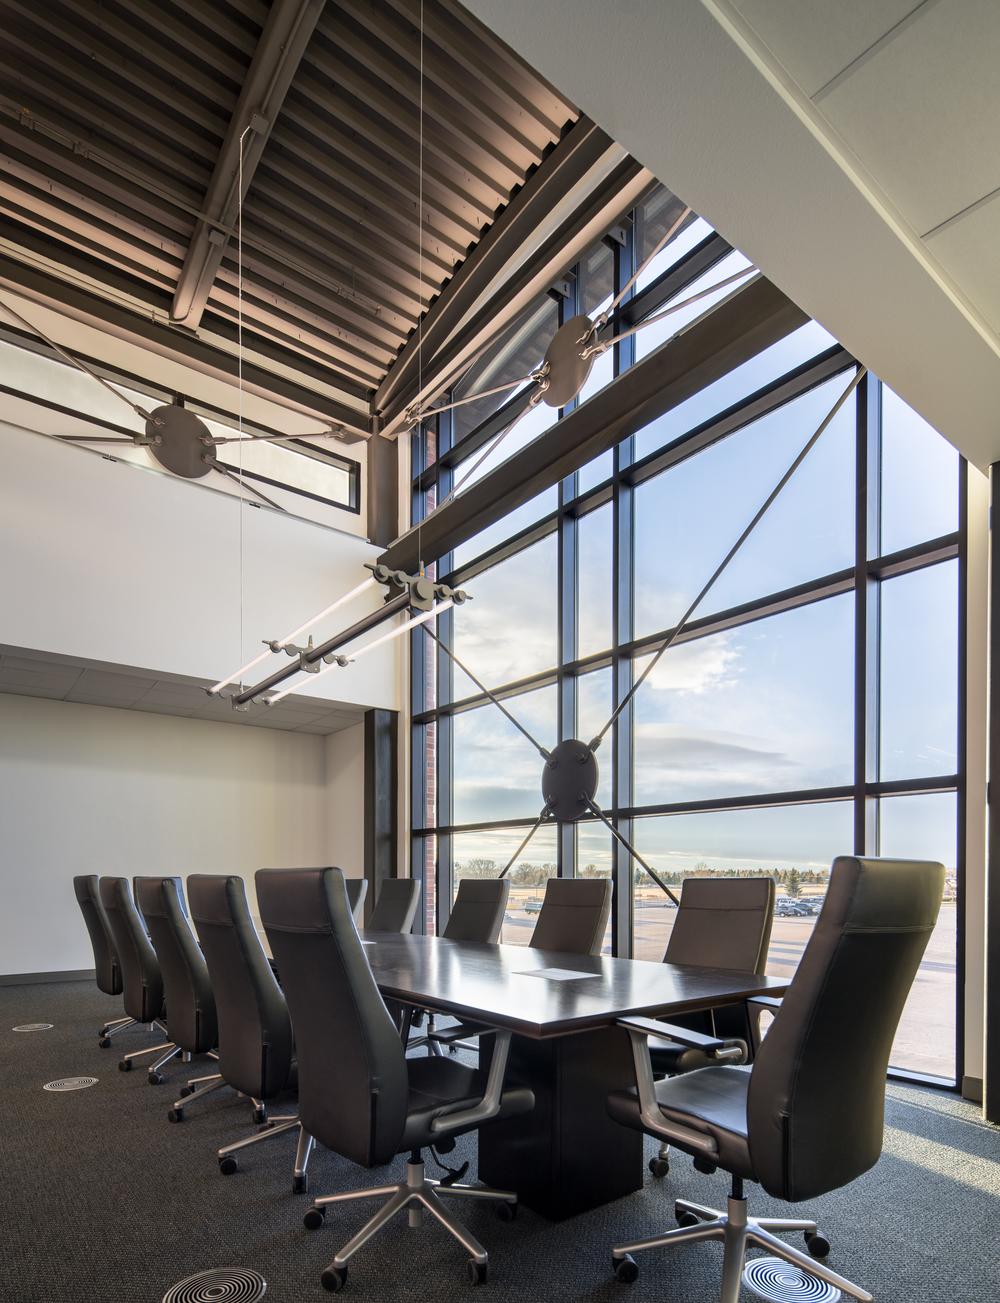 B16 Interior, Conference Room.jpg